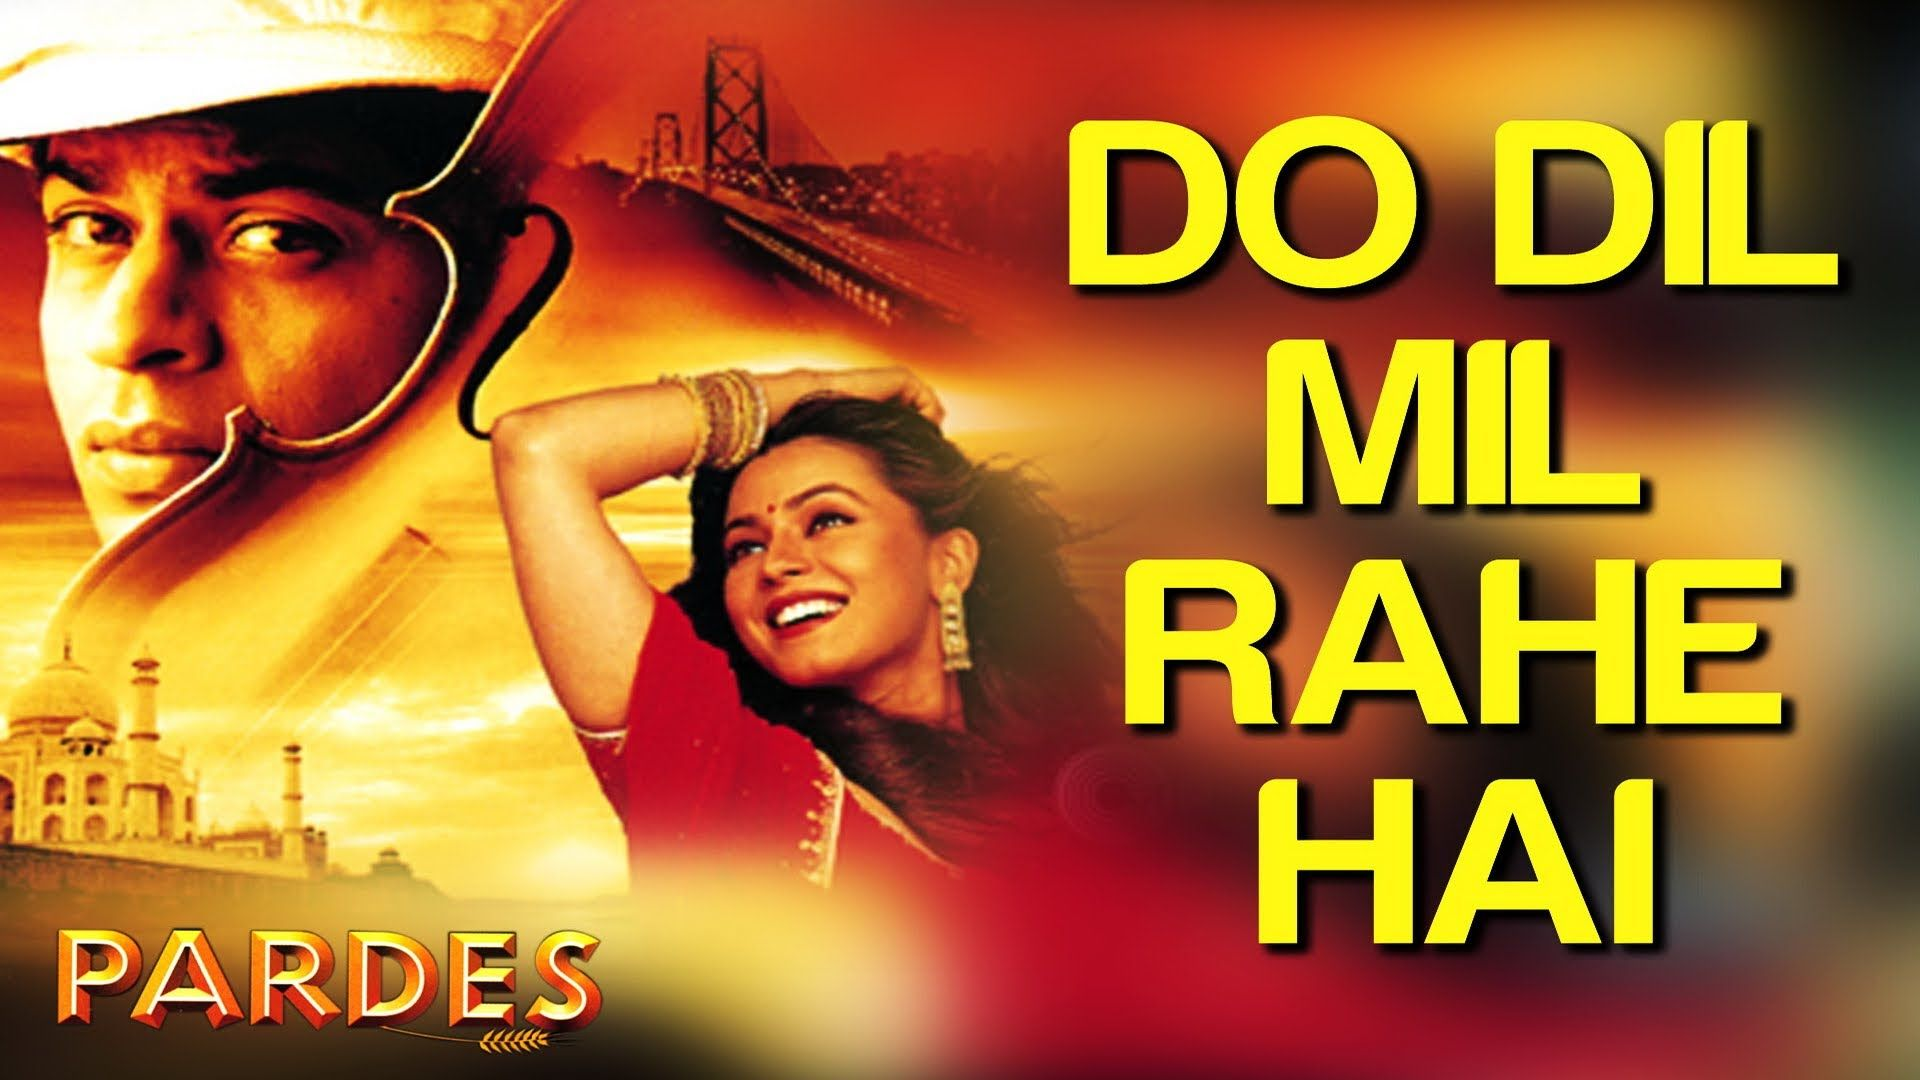 Do Dil Mil Rahe Hai Pardes Shahrukh Khan Mahima Chaudhry Kumar Sanu Song Songs Film Song Romantic Songs